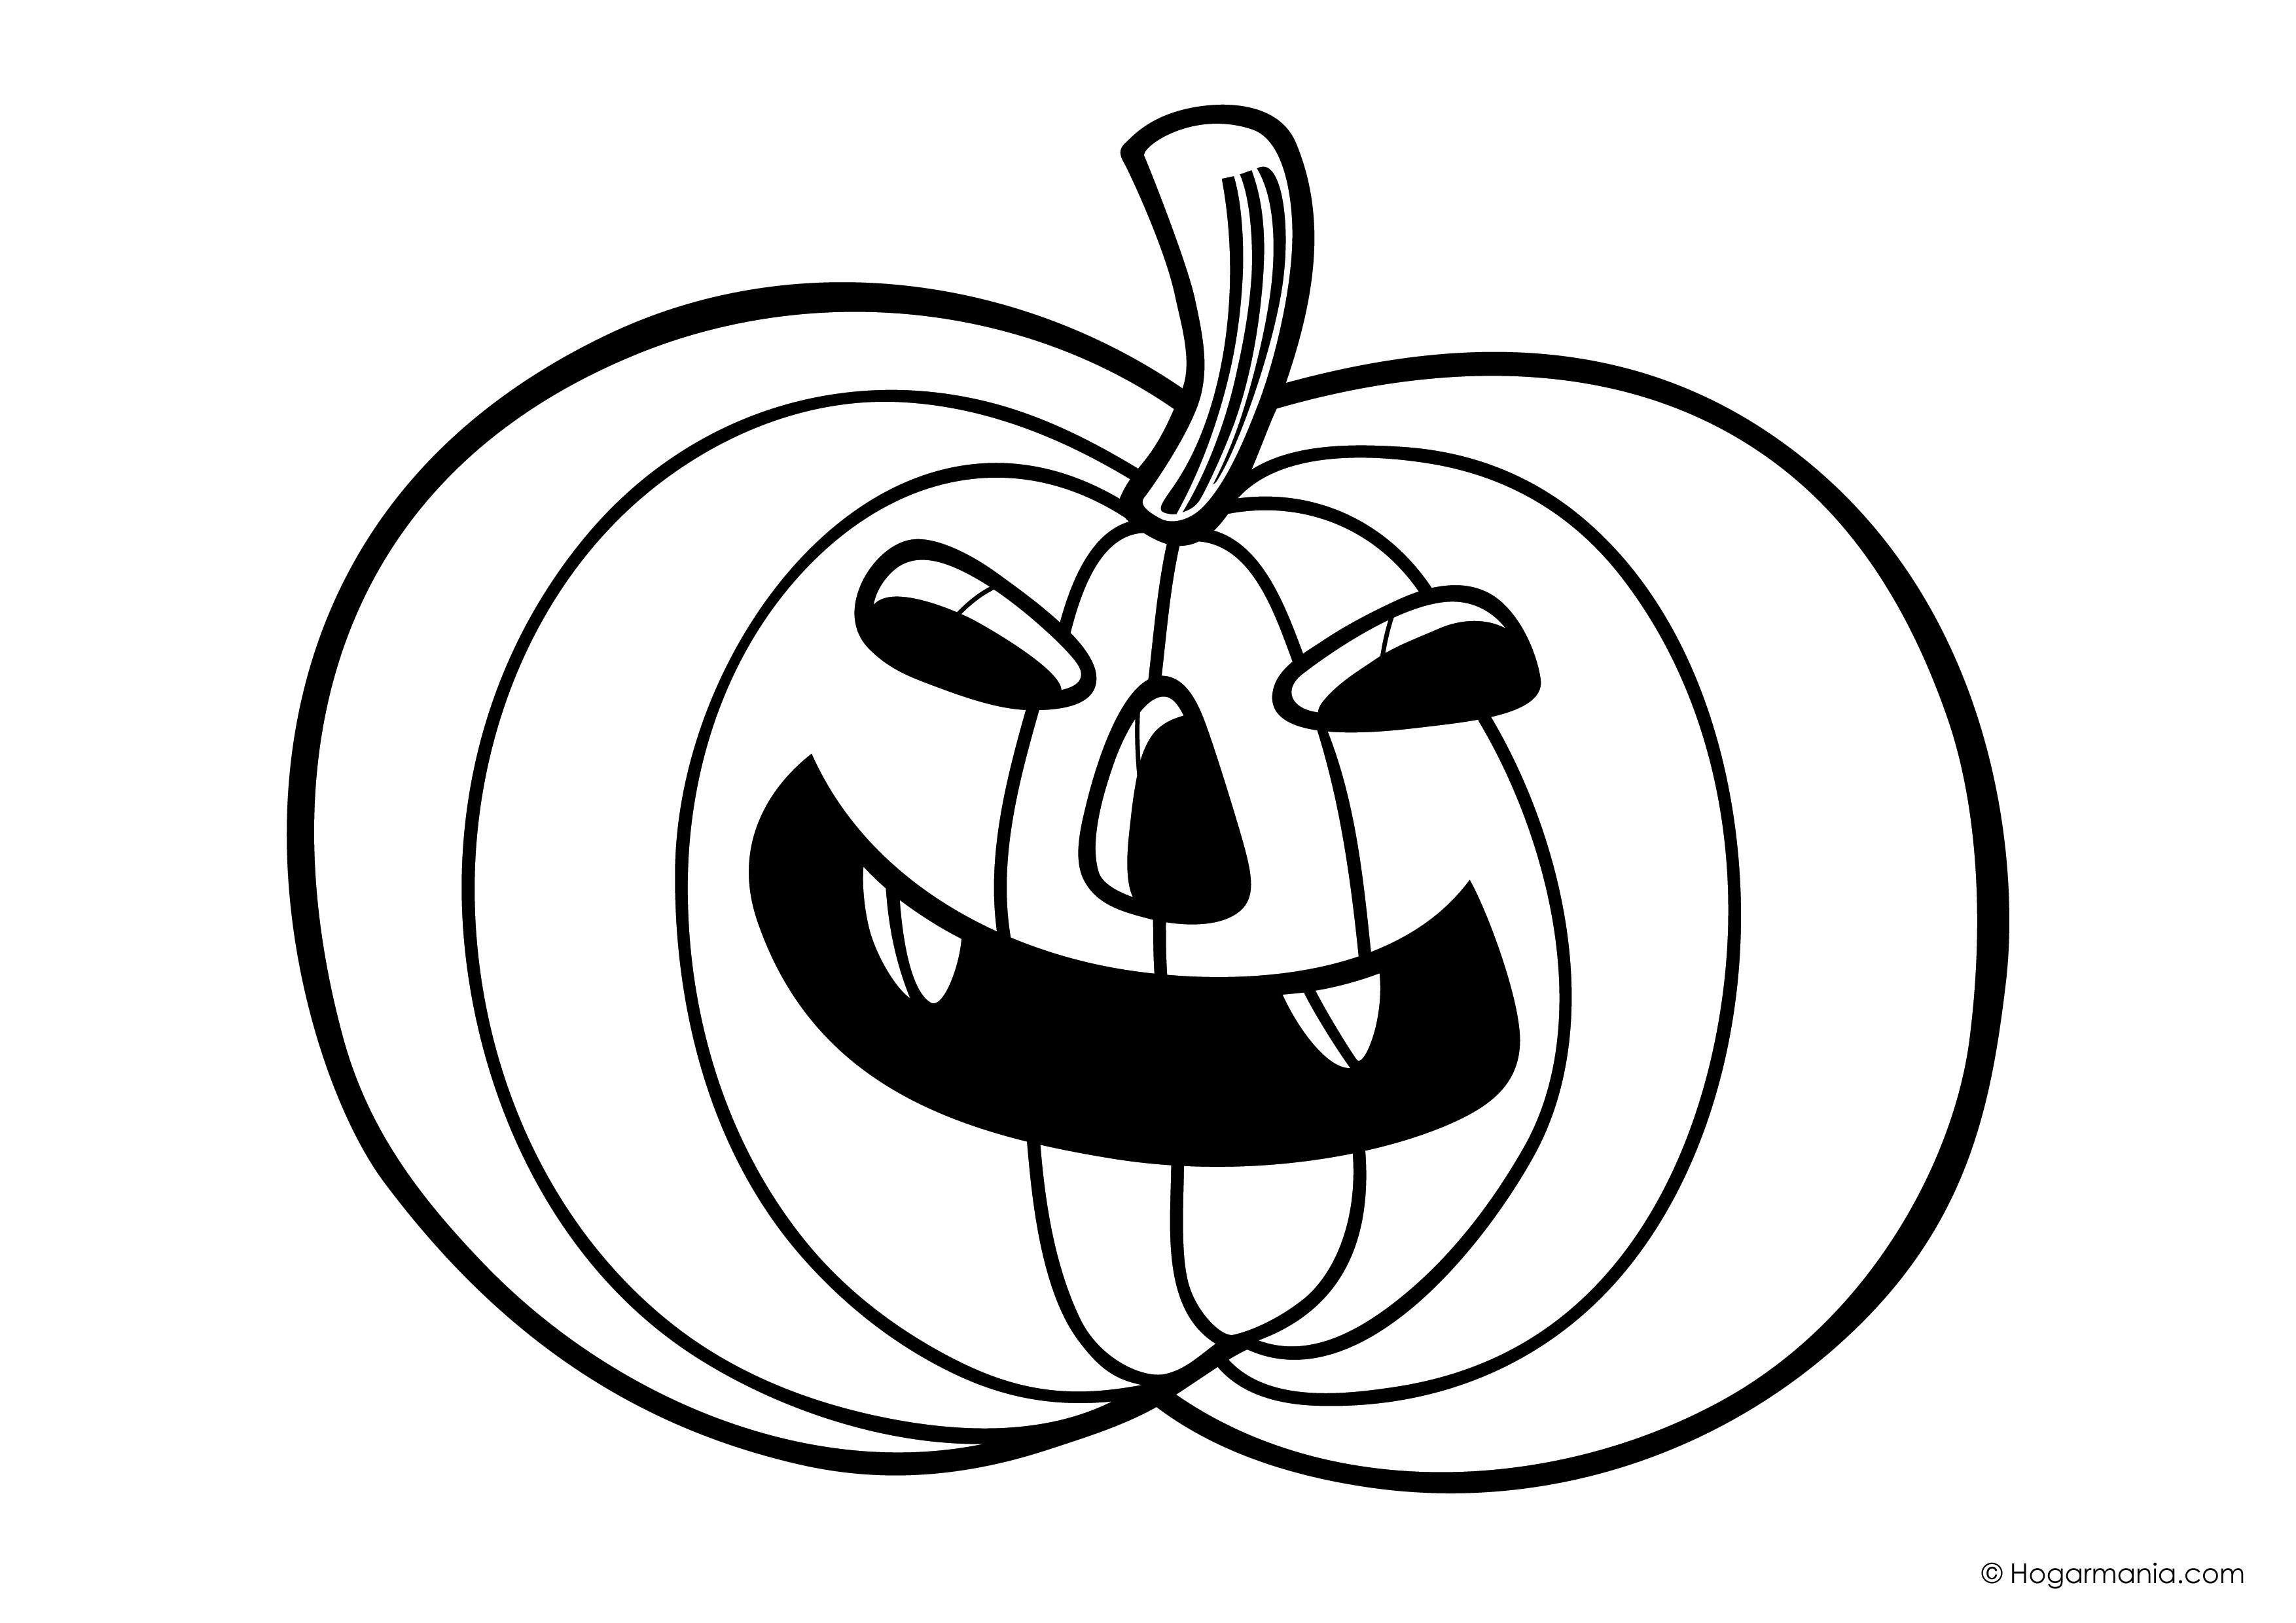 Dibujos Para Colorear De Calabazas De Halloween Para Imprimir: Calabazas Halloween Para Imprimir. Careta. Latest Dibujos